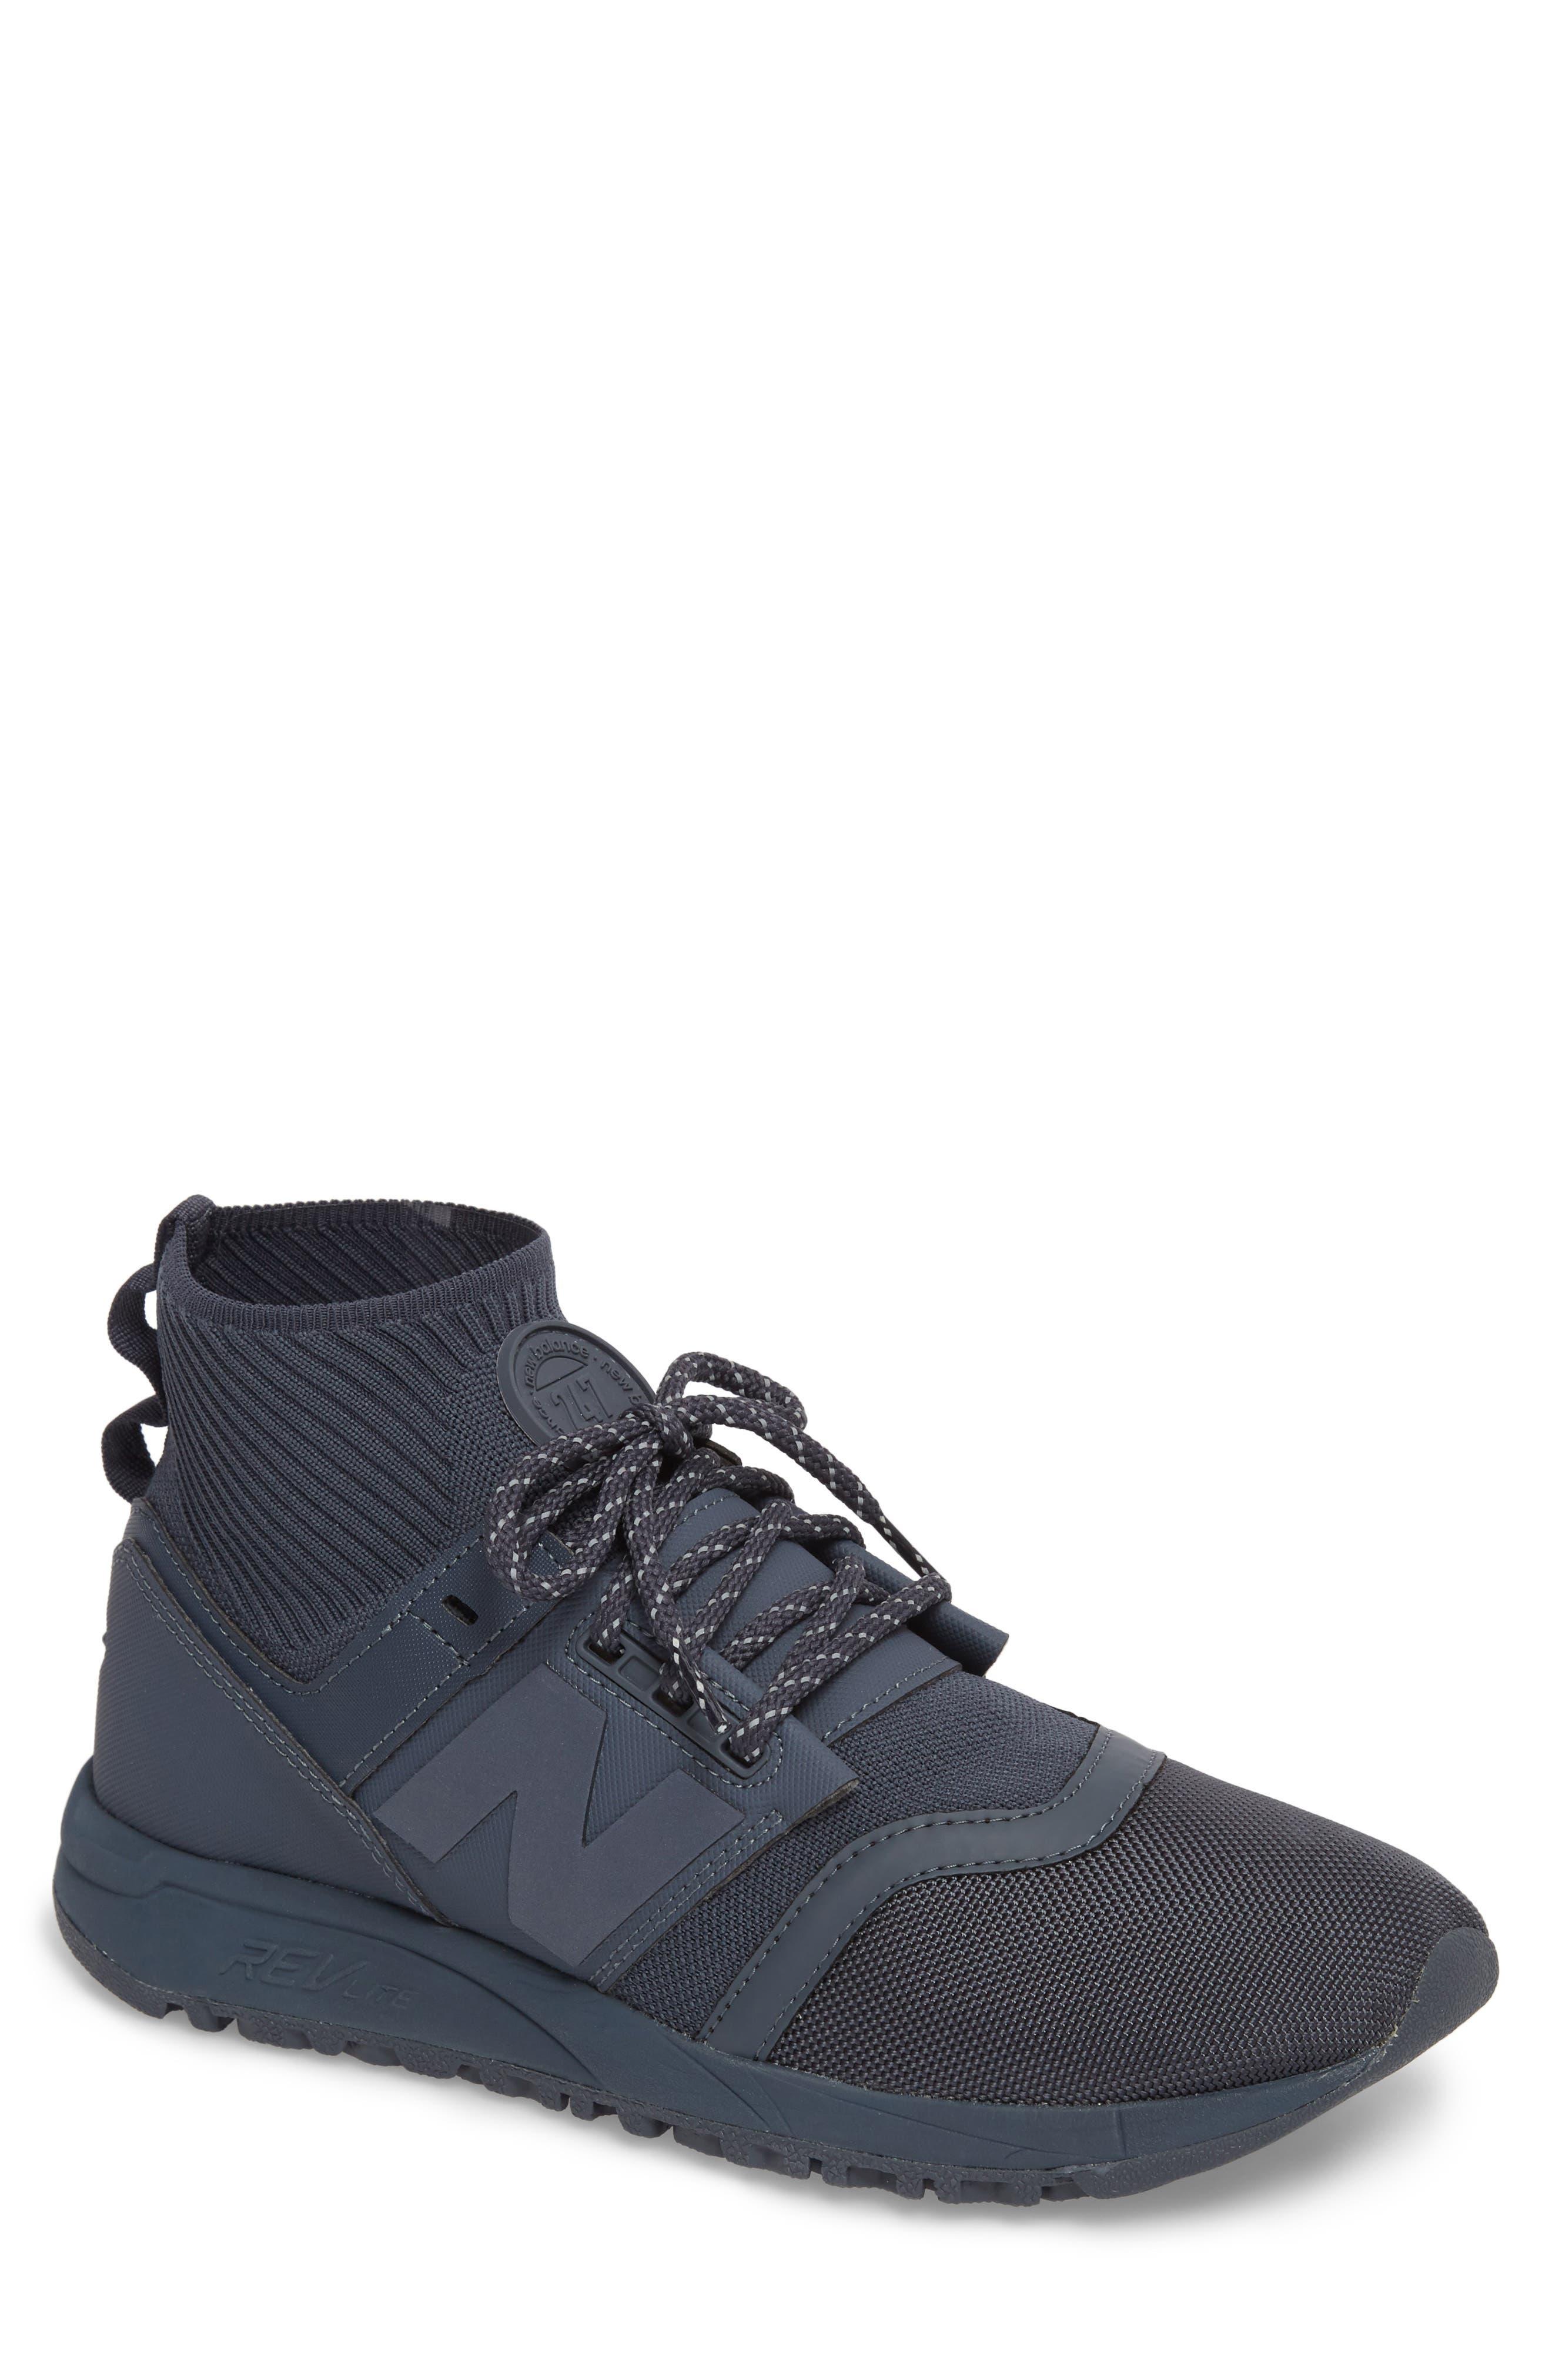 247 Mid Sneaker,                             Main thumbnail 4, color,